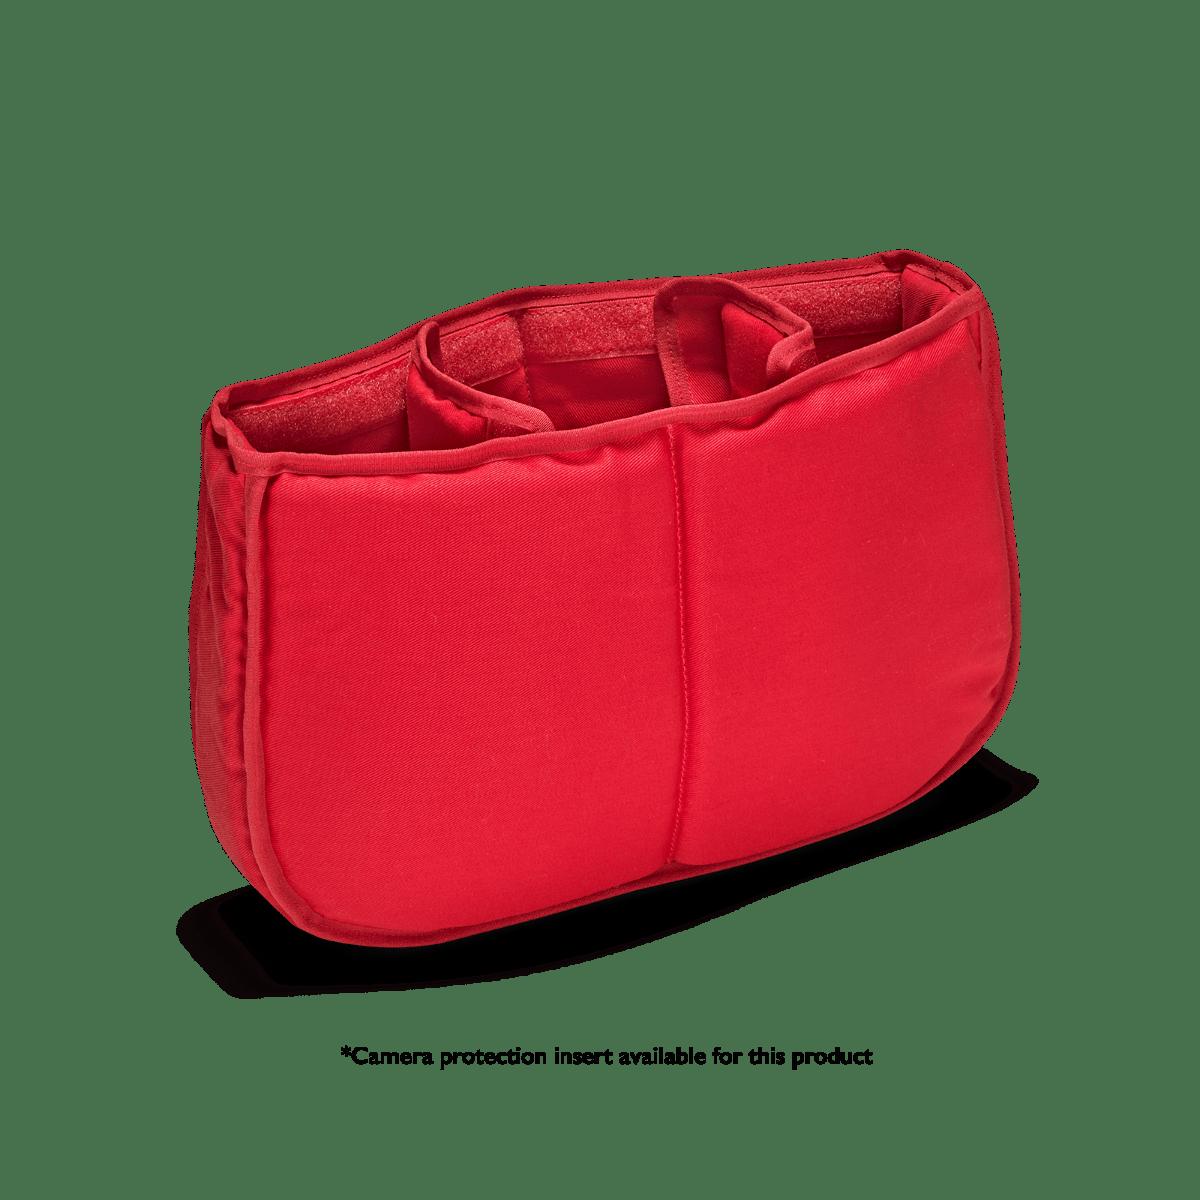 Vintage Leather Carryall 7